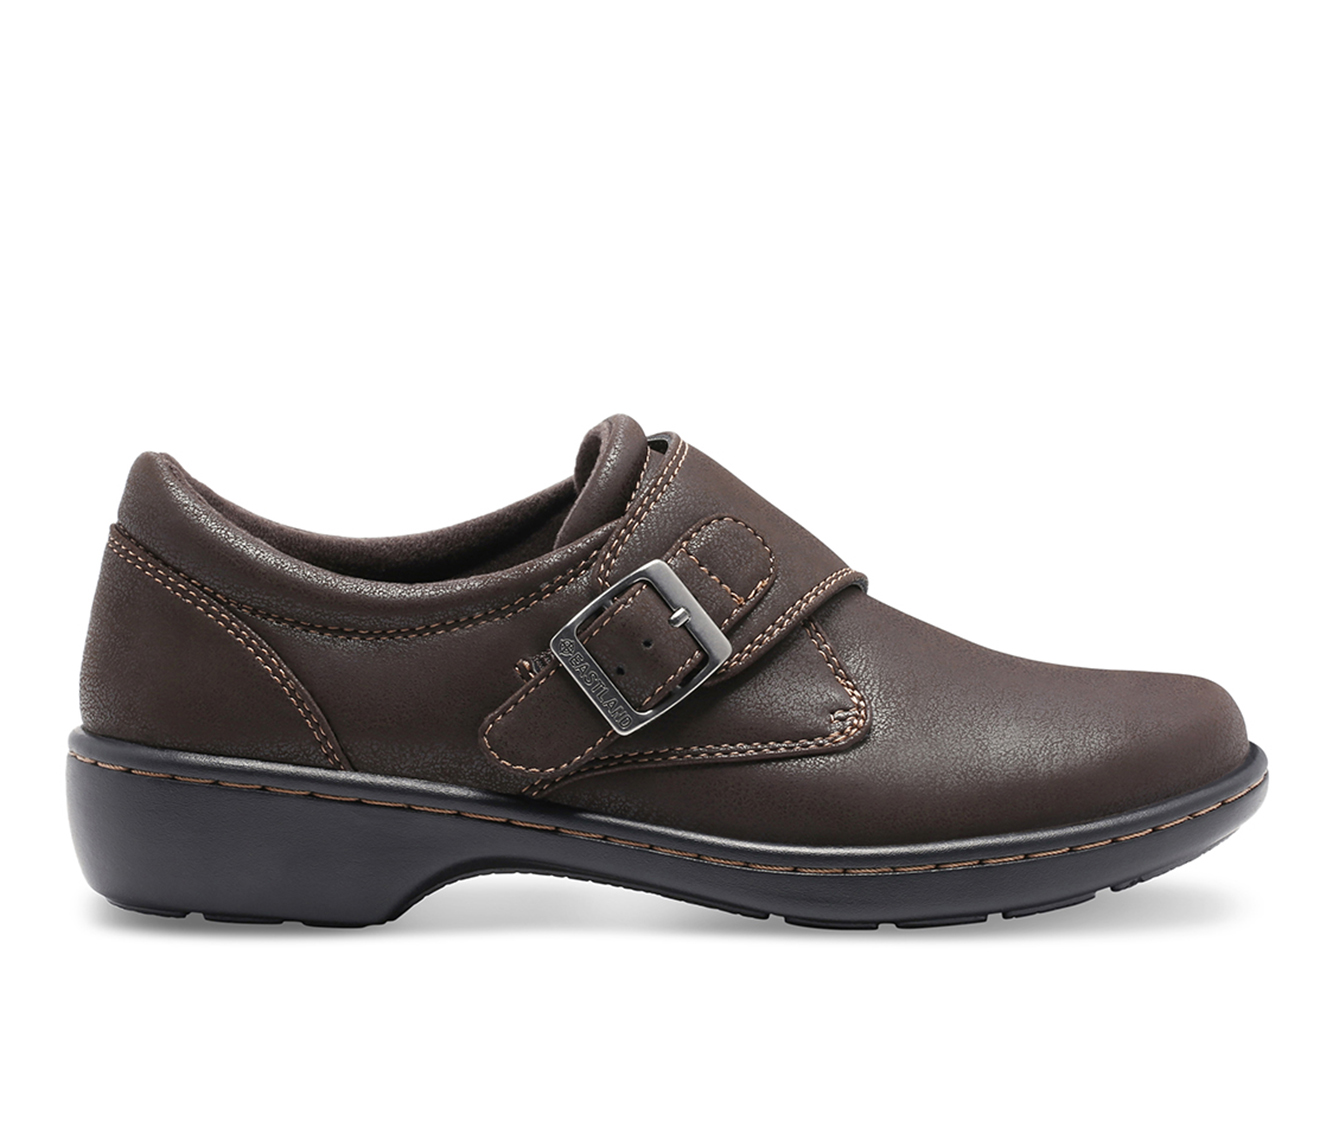 Eastland Sherri Women's Shoe (Brown Leather)